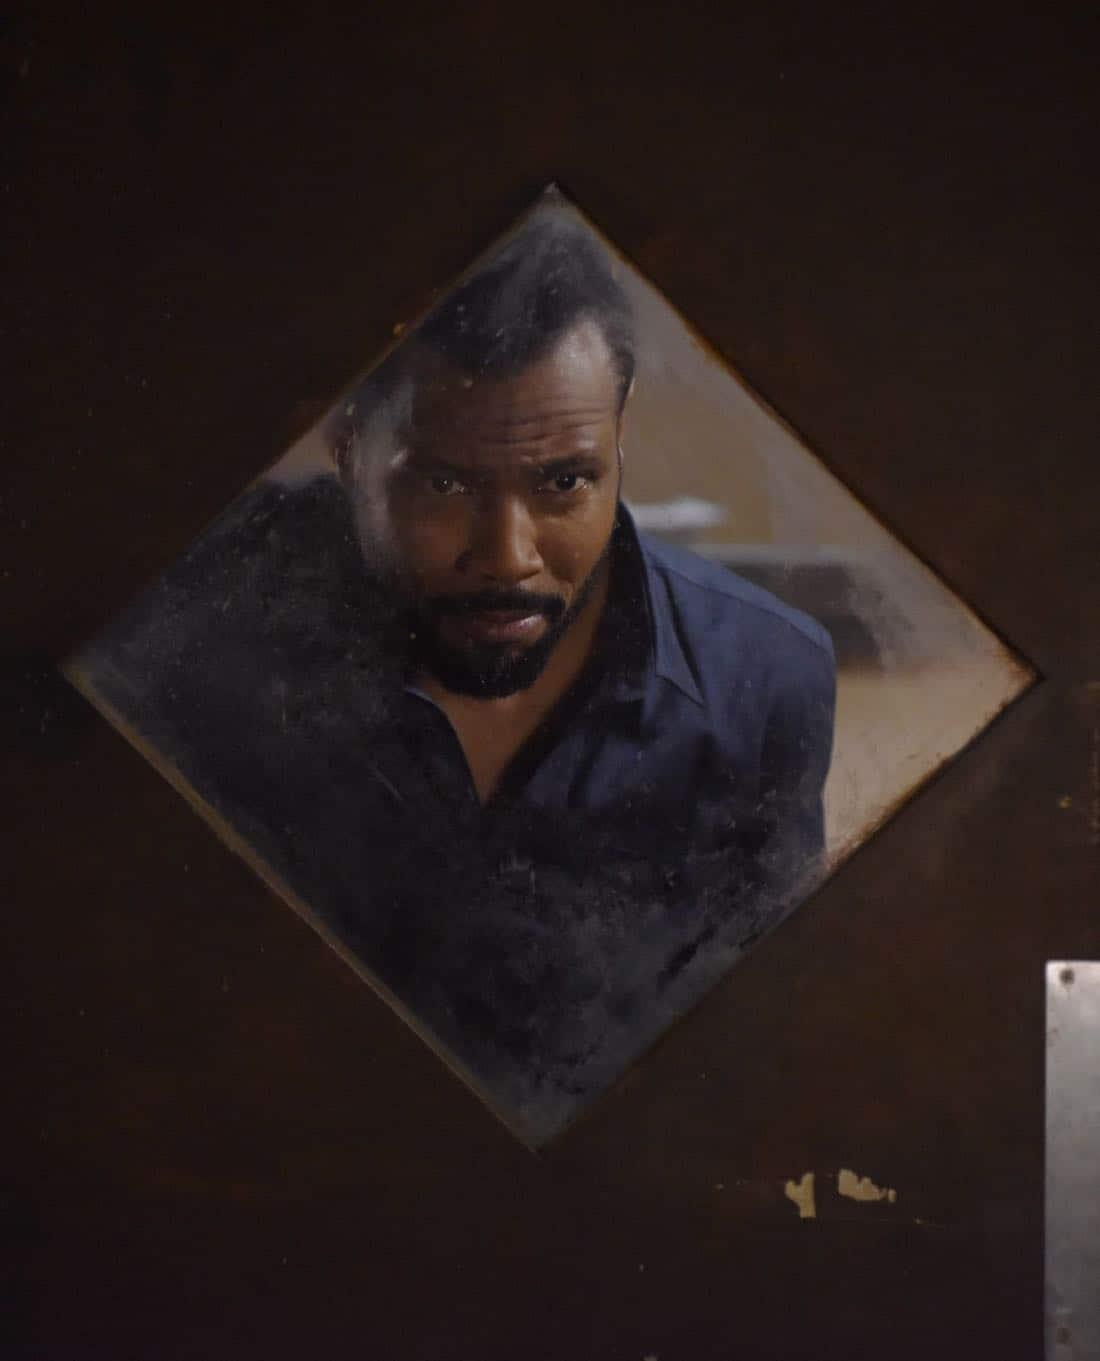 Shadowhunters Episode 1 Season 3 On Infernal Ground 03